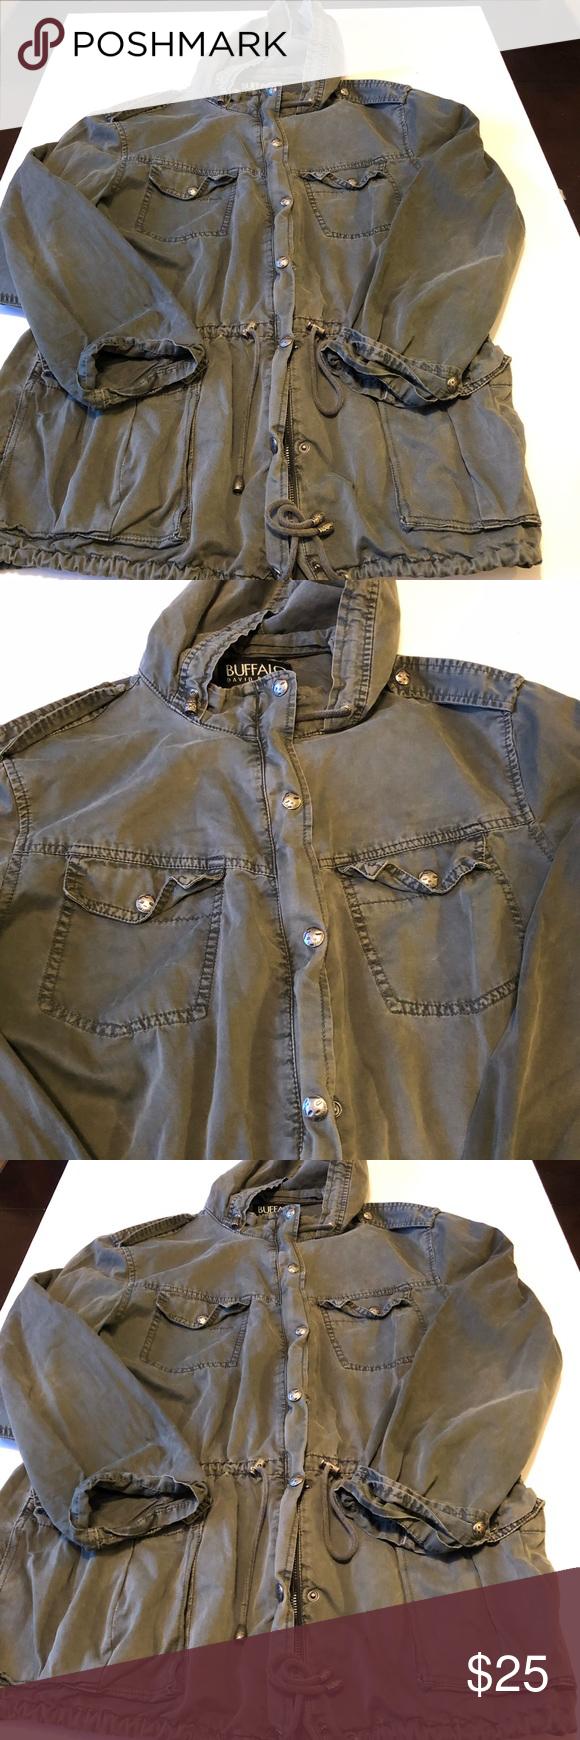 Buffalo David Bitton Jacket Olive Green Military Jacket Military Jacket Green Clothes Design [ 1740 x 580 Pixel ]